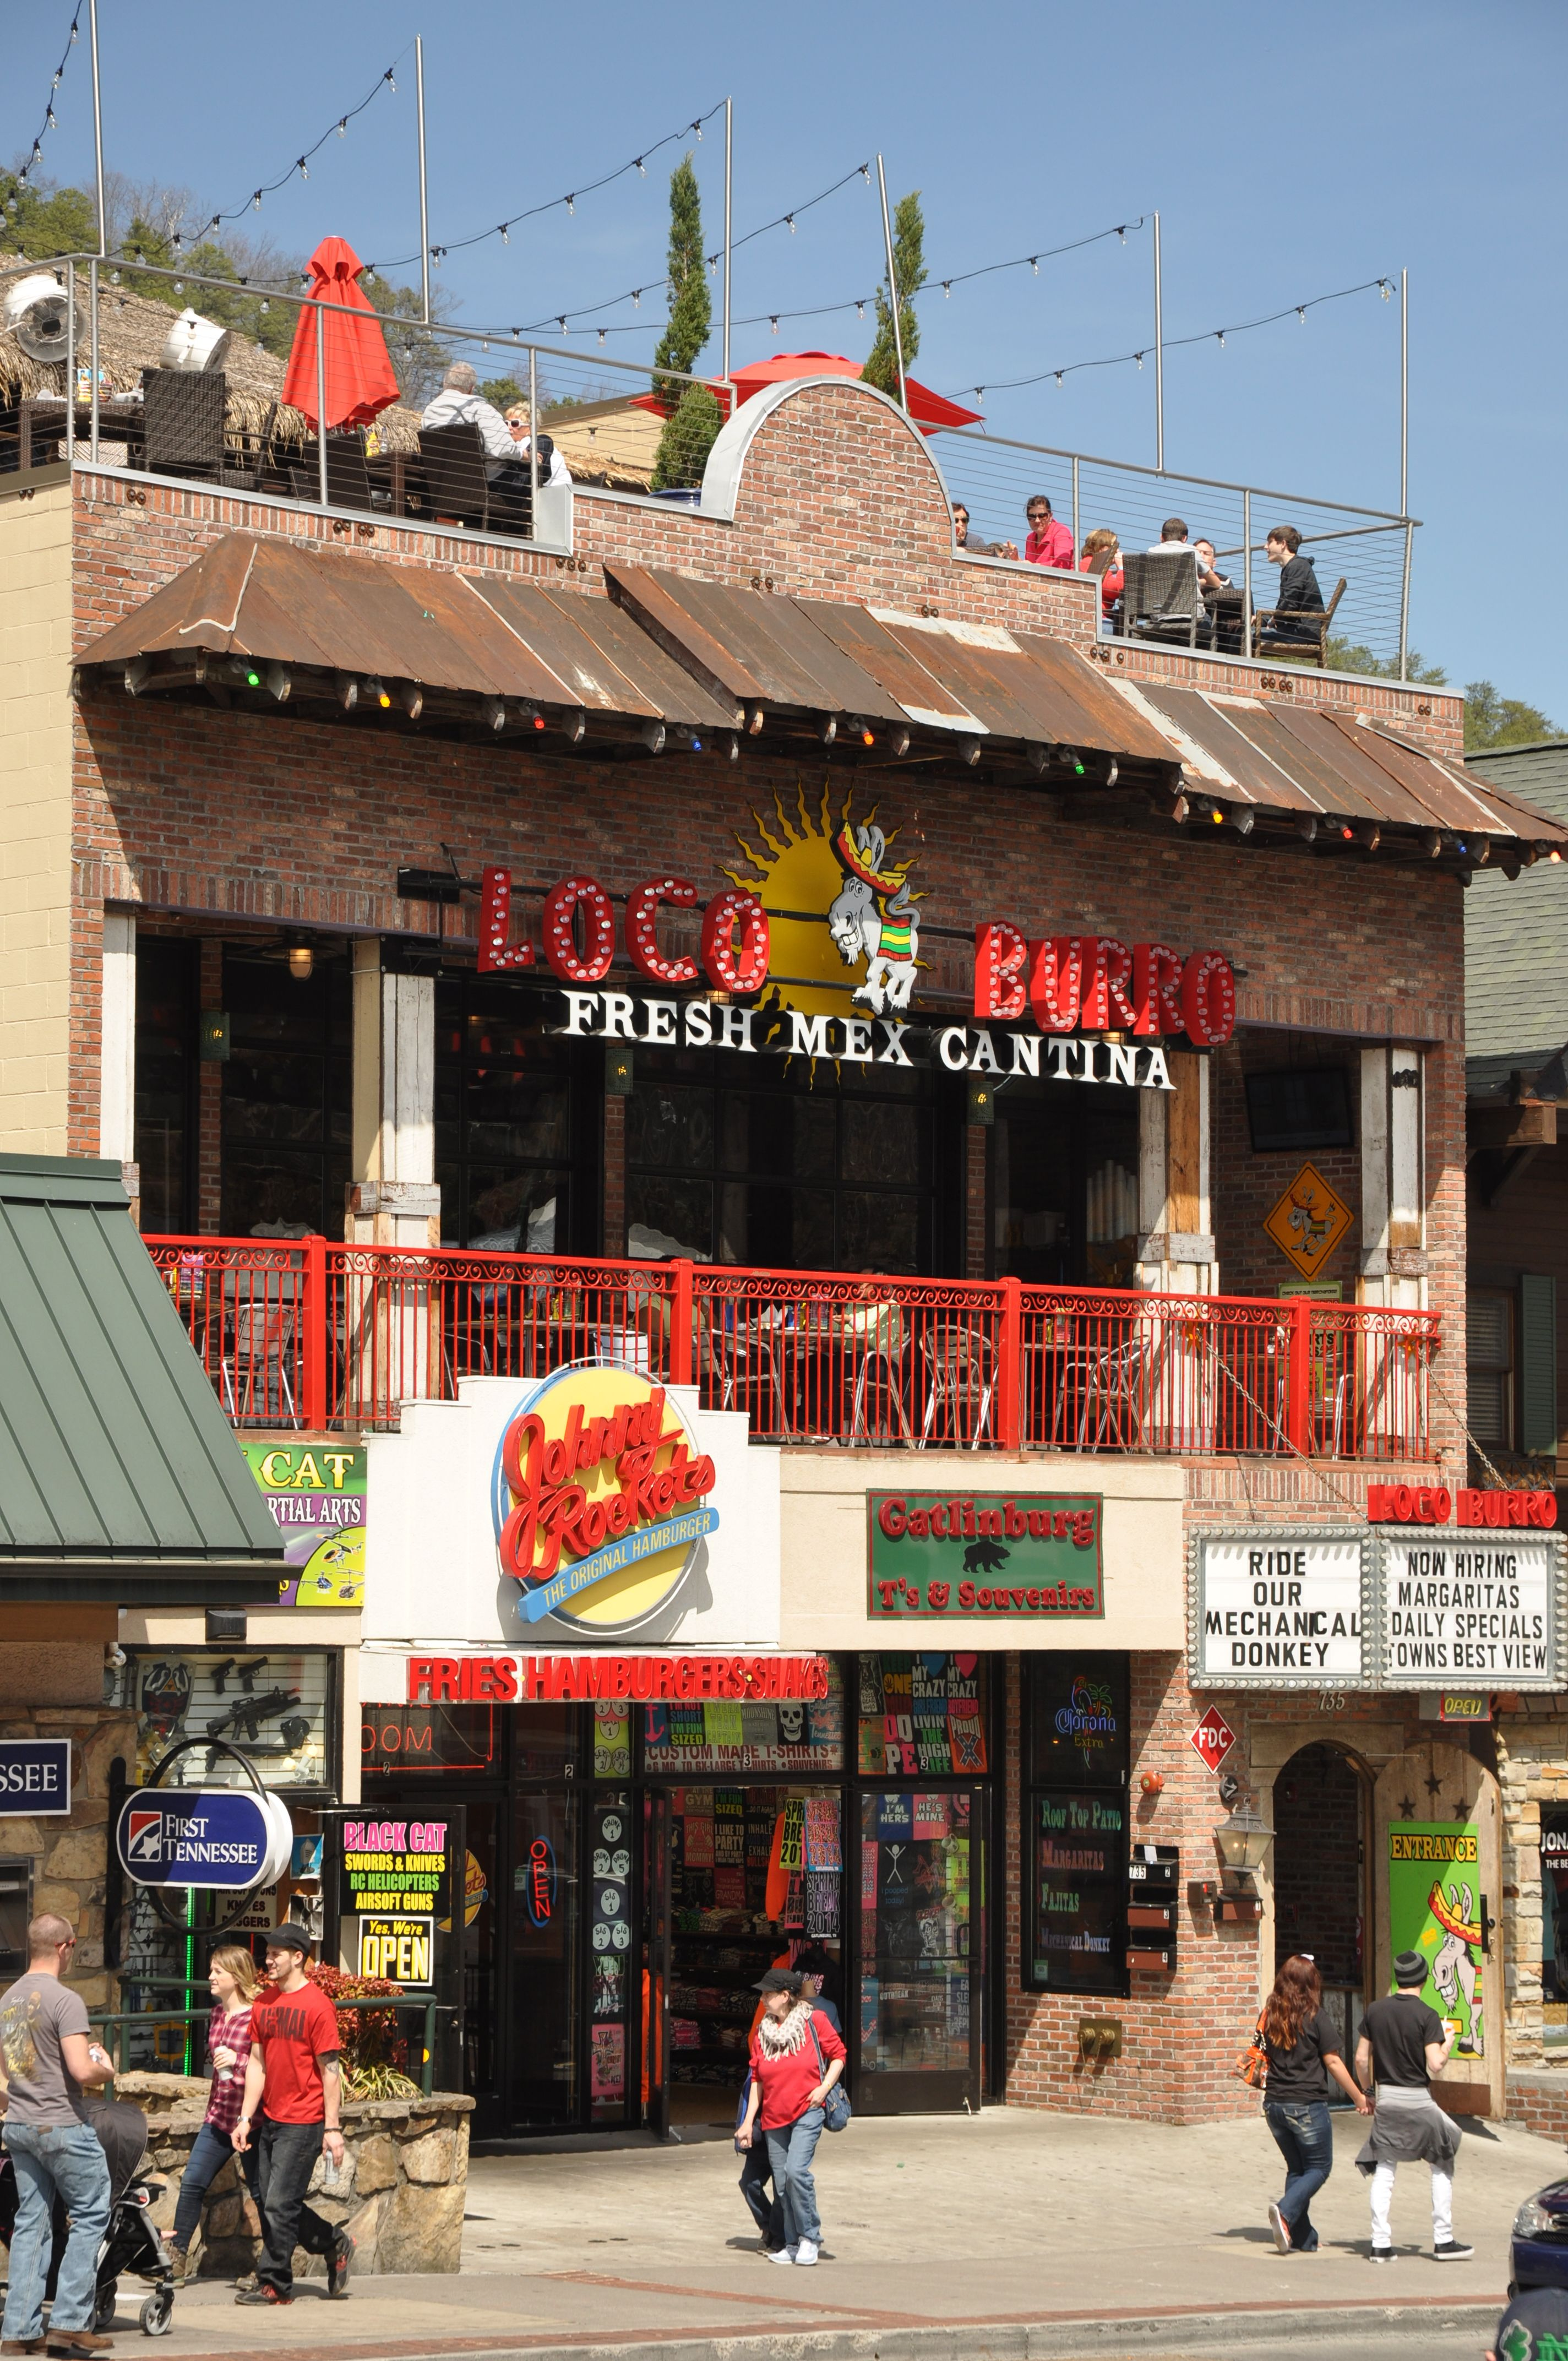 Loco Burro   Fresh Mex Cantina   Delicious Mexican Cuisine In Gatlinburg!